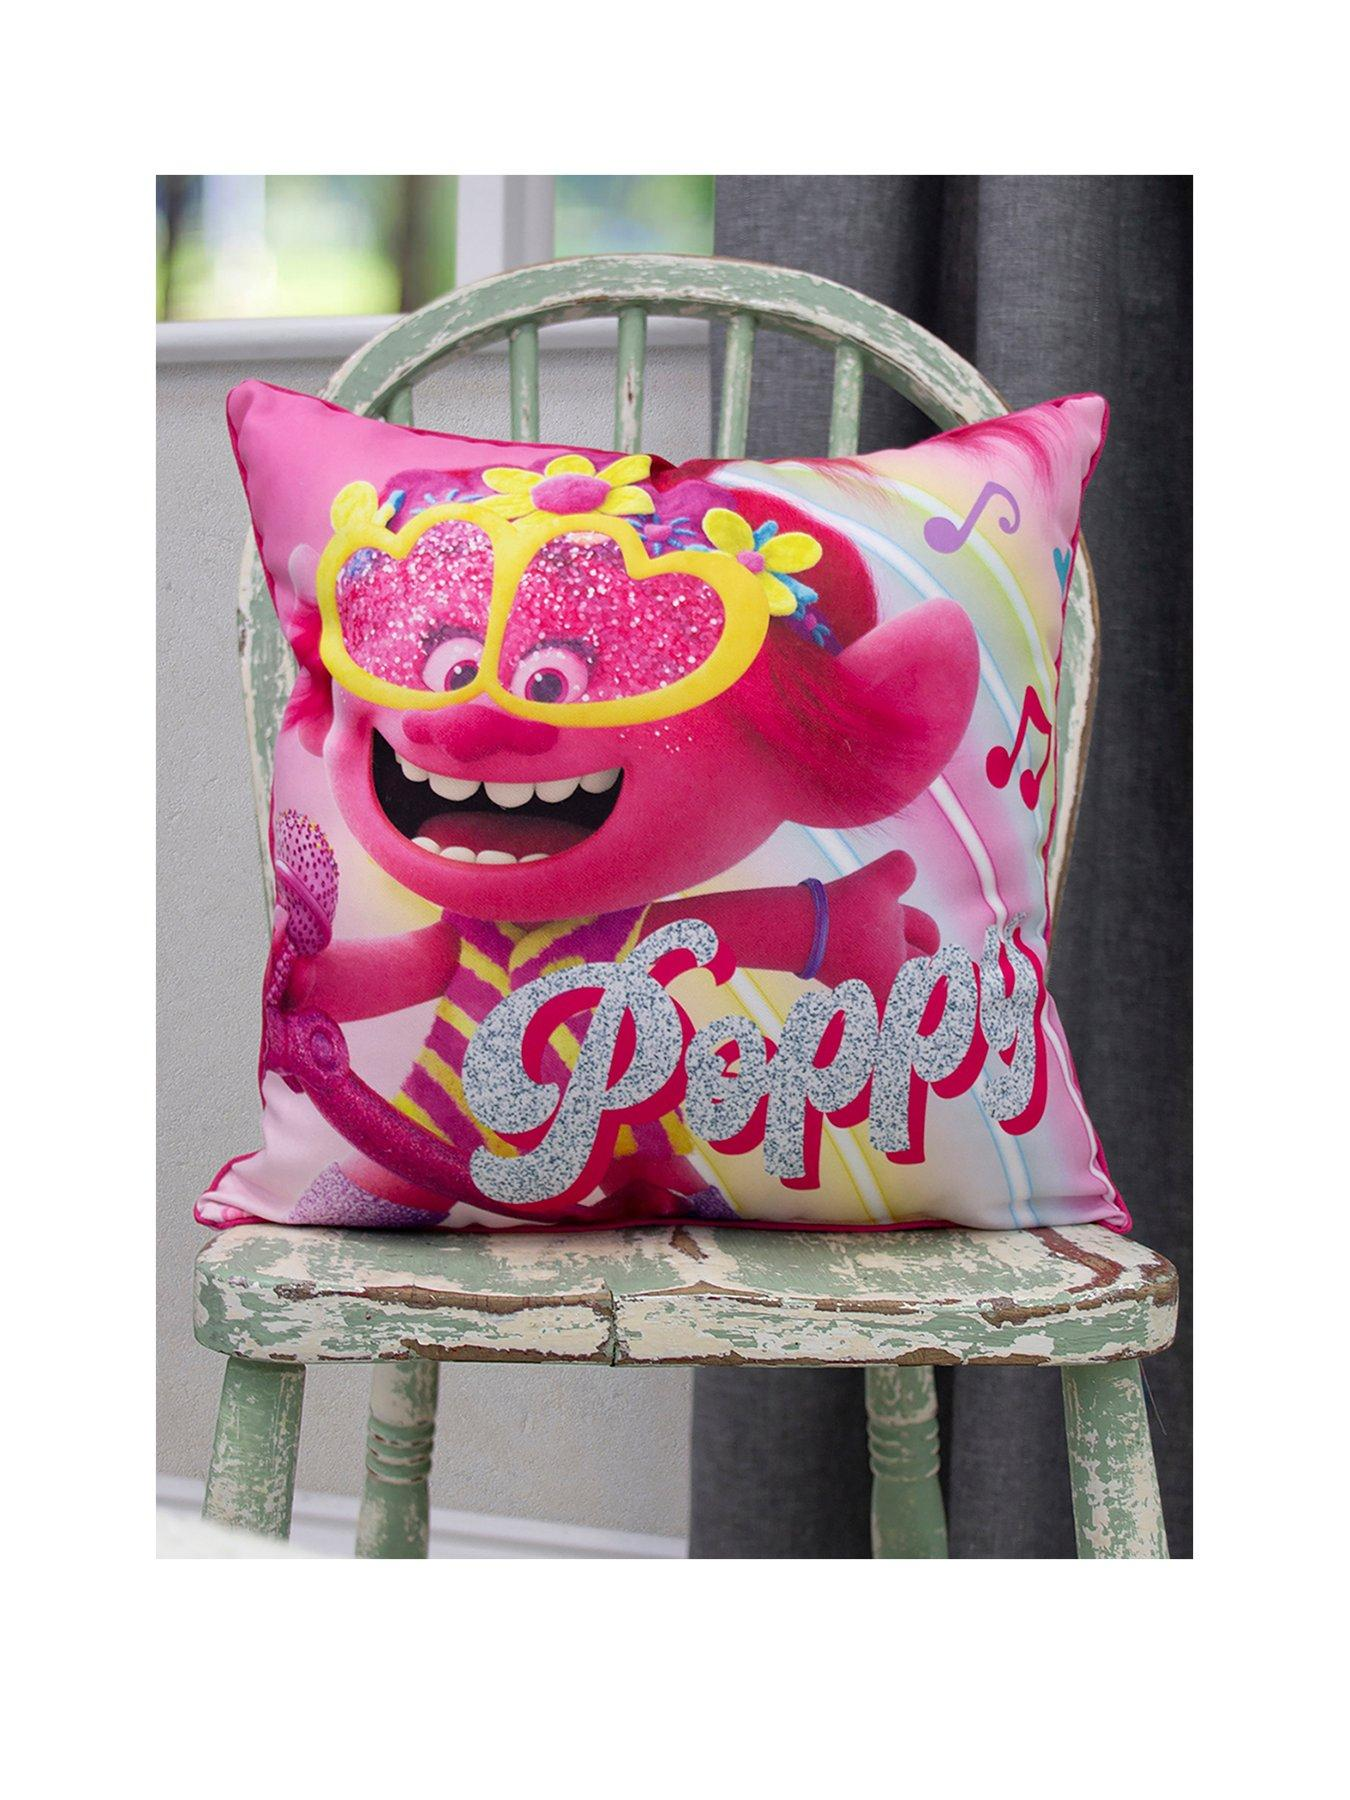 100/% Cotton Fabric Magical Trolls Poppy Cooper Guy Diamond 150cm Wide